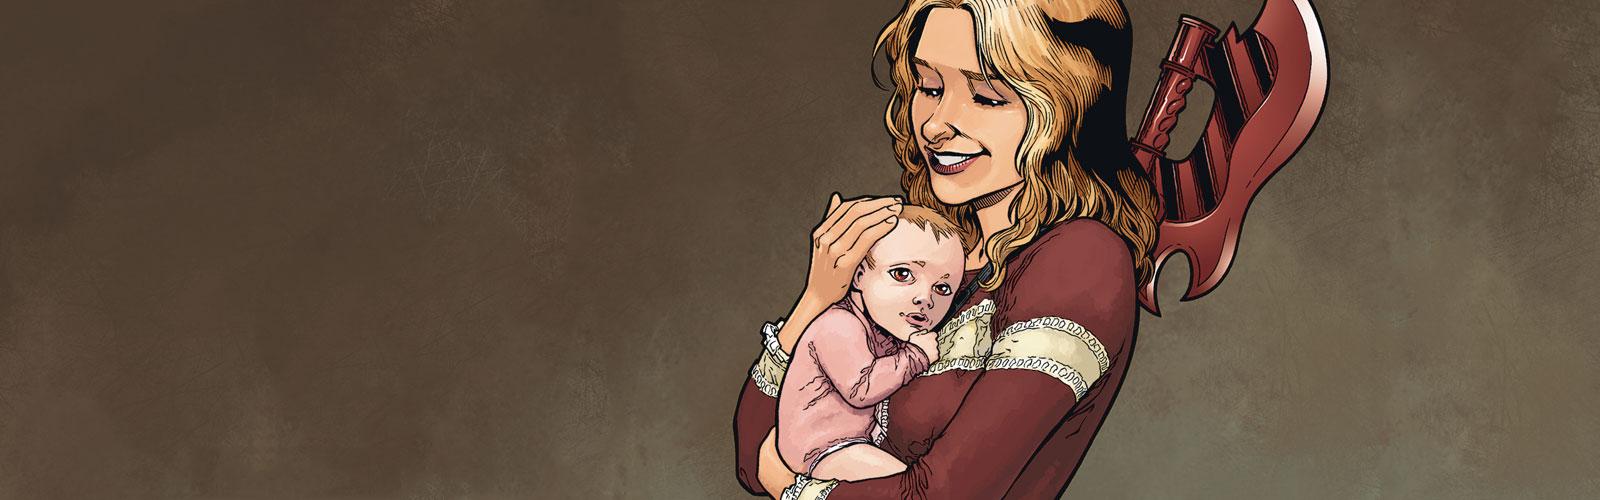 Buffy the Vampire Slayer Season 12: The Reckoning #1